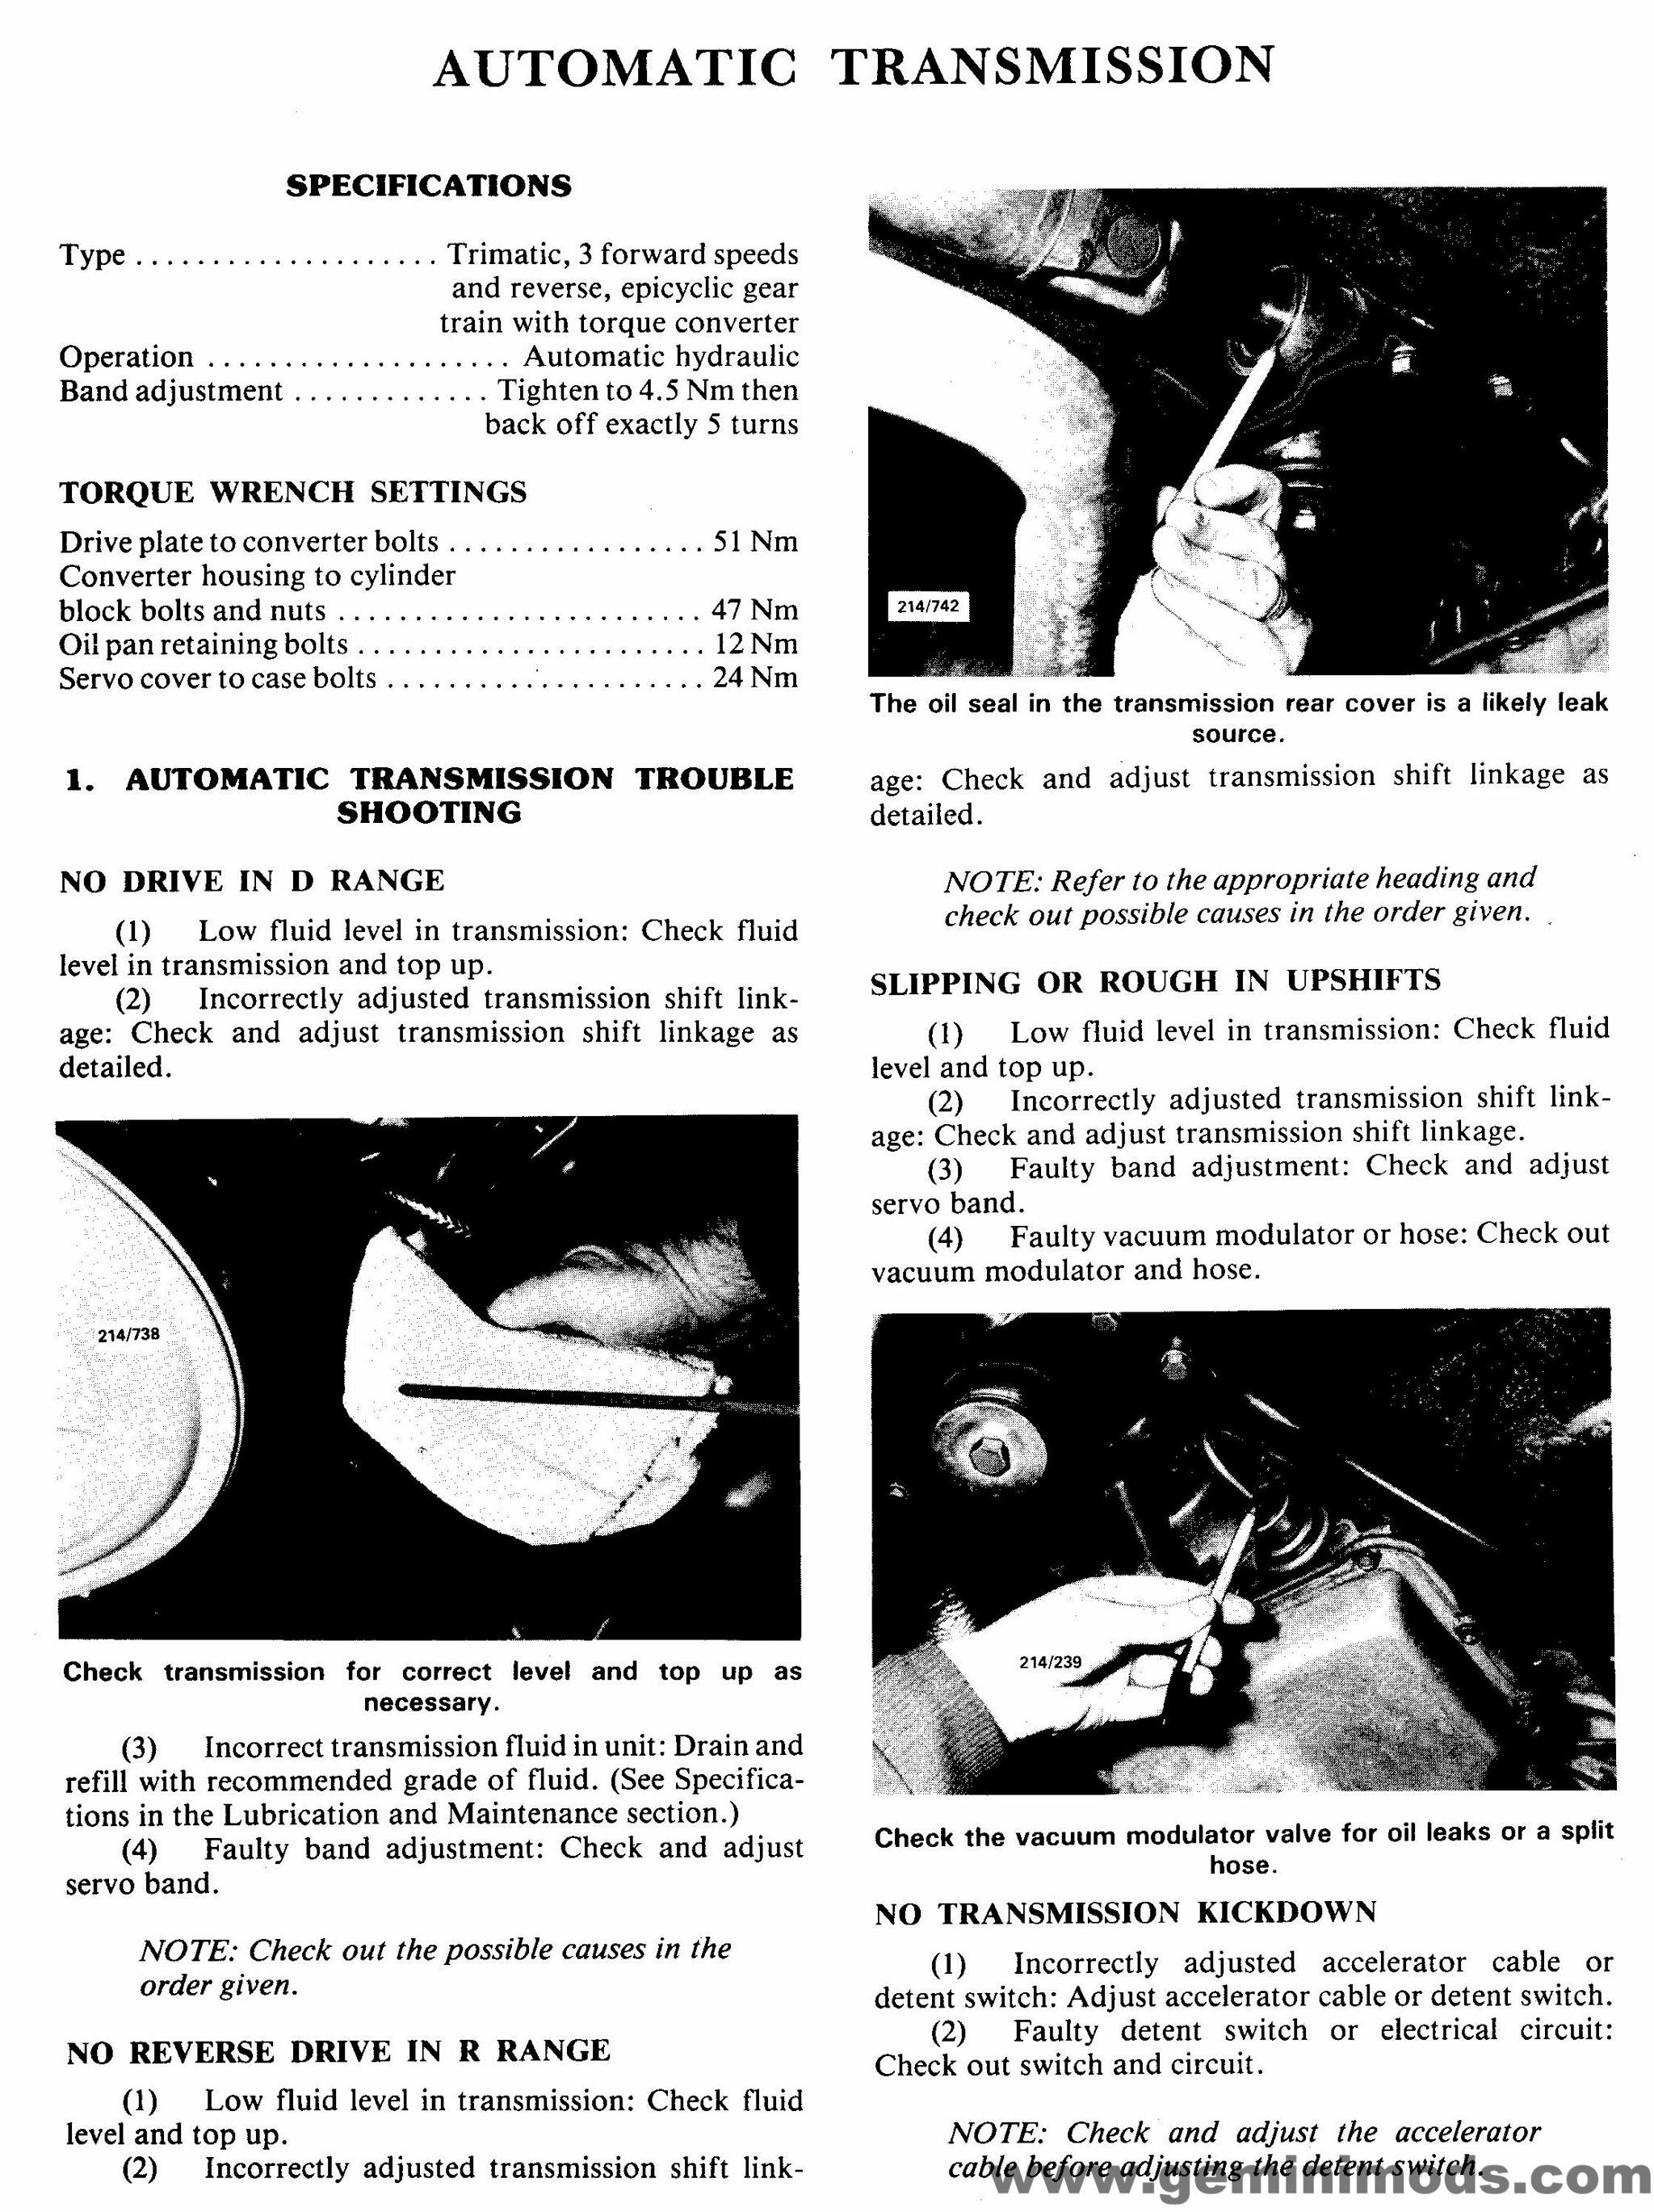 Engine/Body troubleshooting & specifications | Isuzu & Holden Gemini